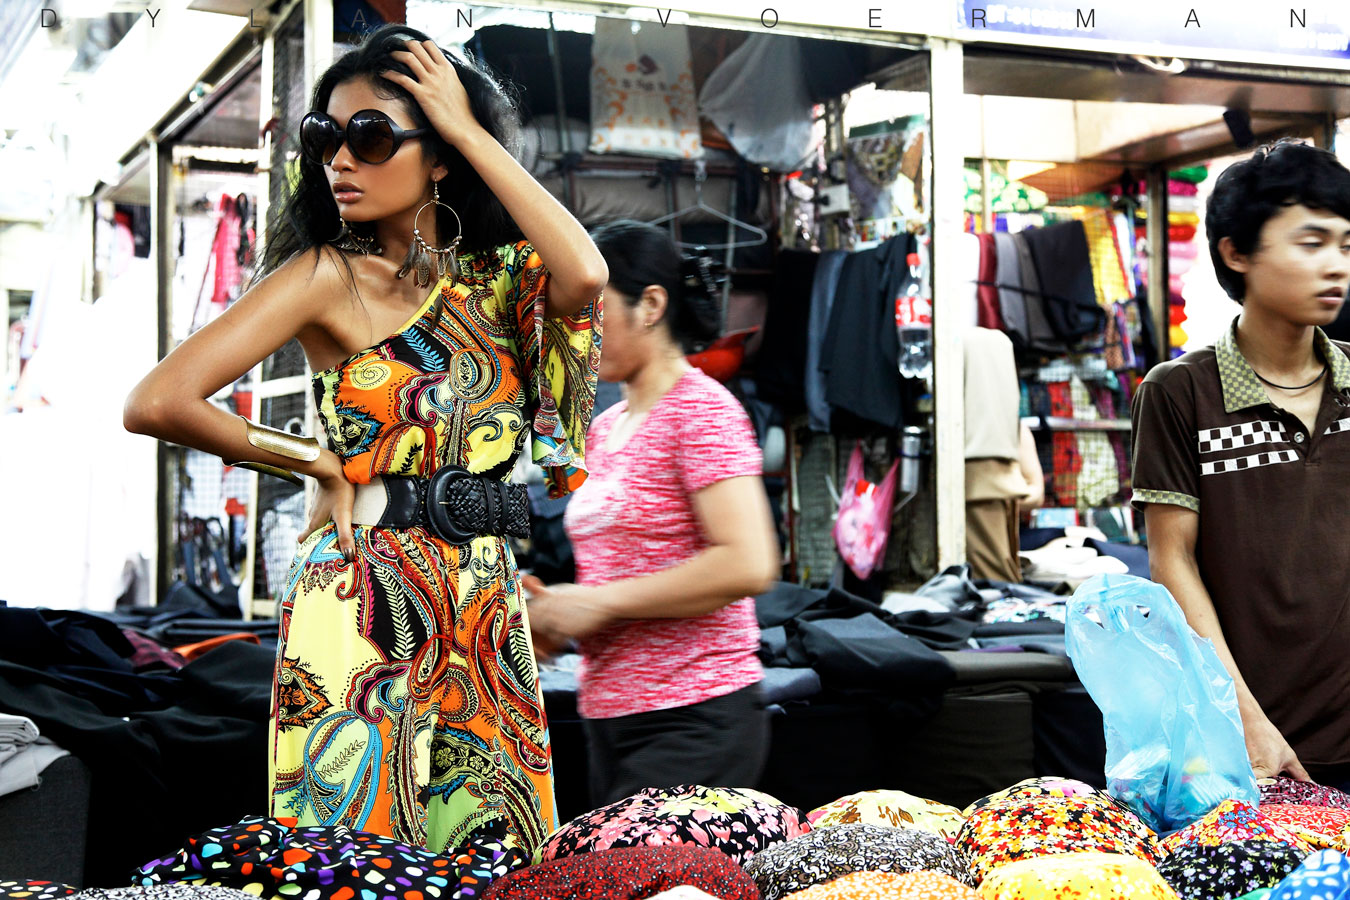 Chanok Sayoungkul in Hanoi Vietnam